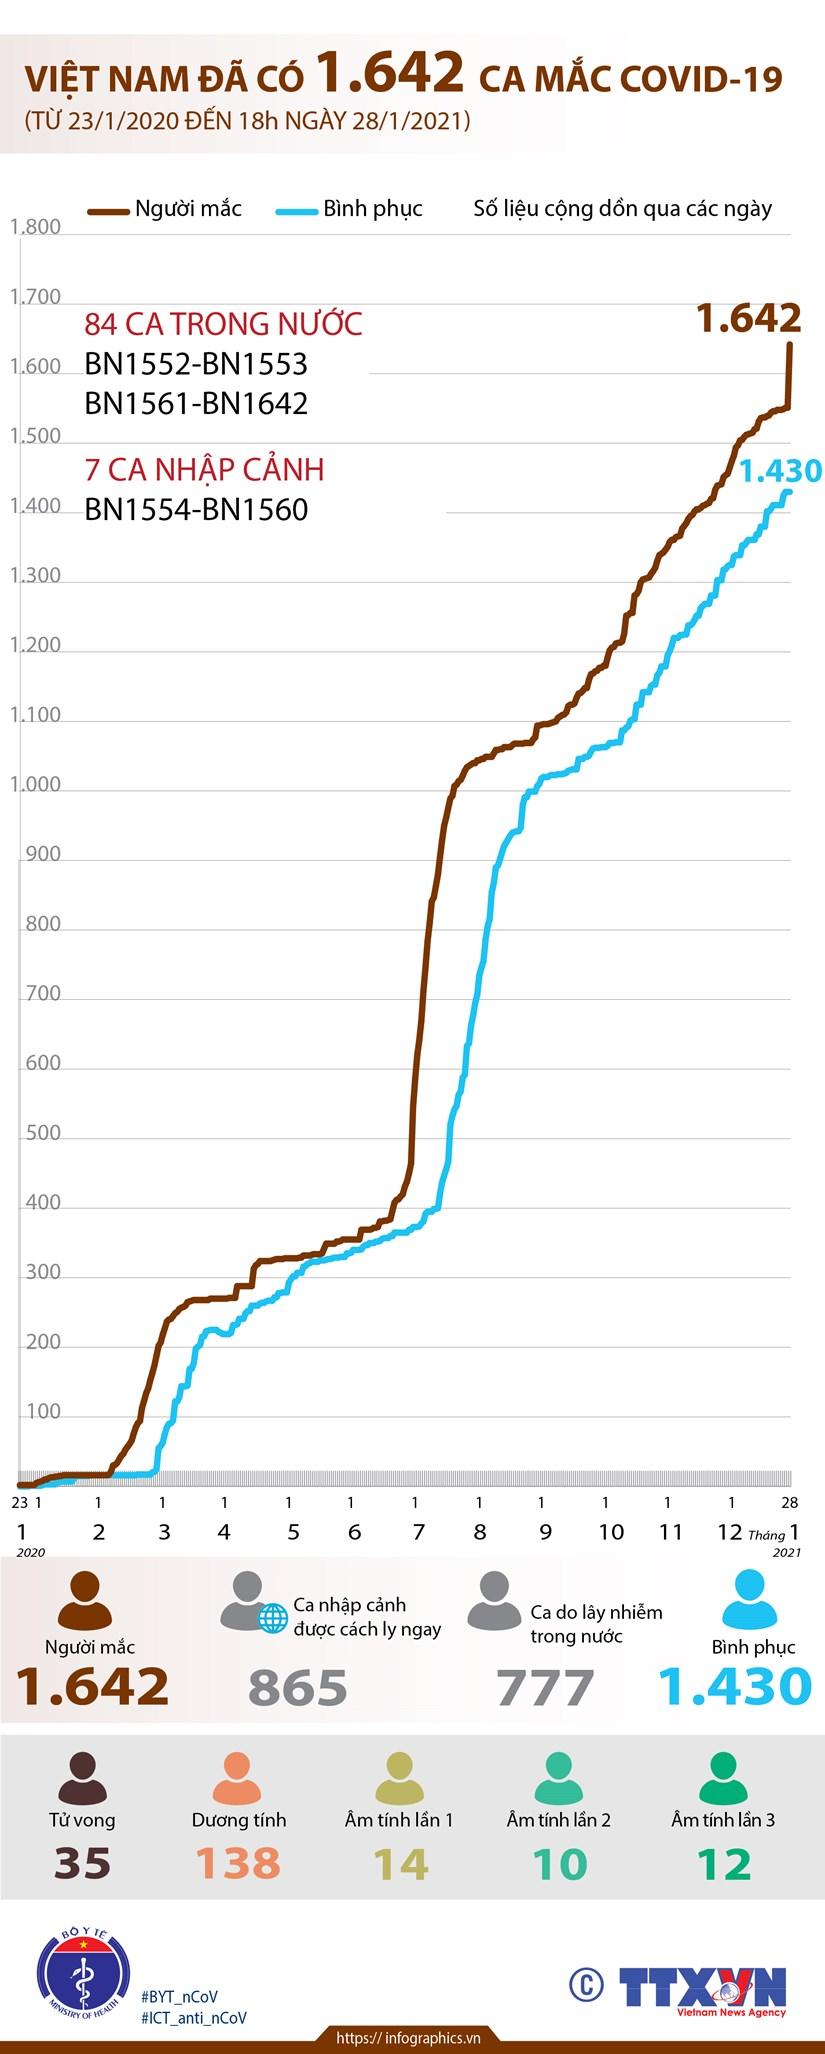 [Infographics] Viet Nam da co 1.642 ca mac dich benh COVID-19 hinh anh 1